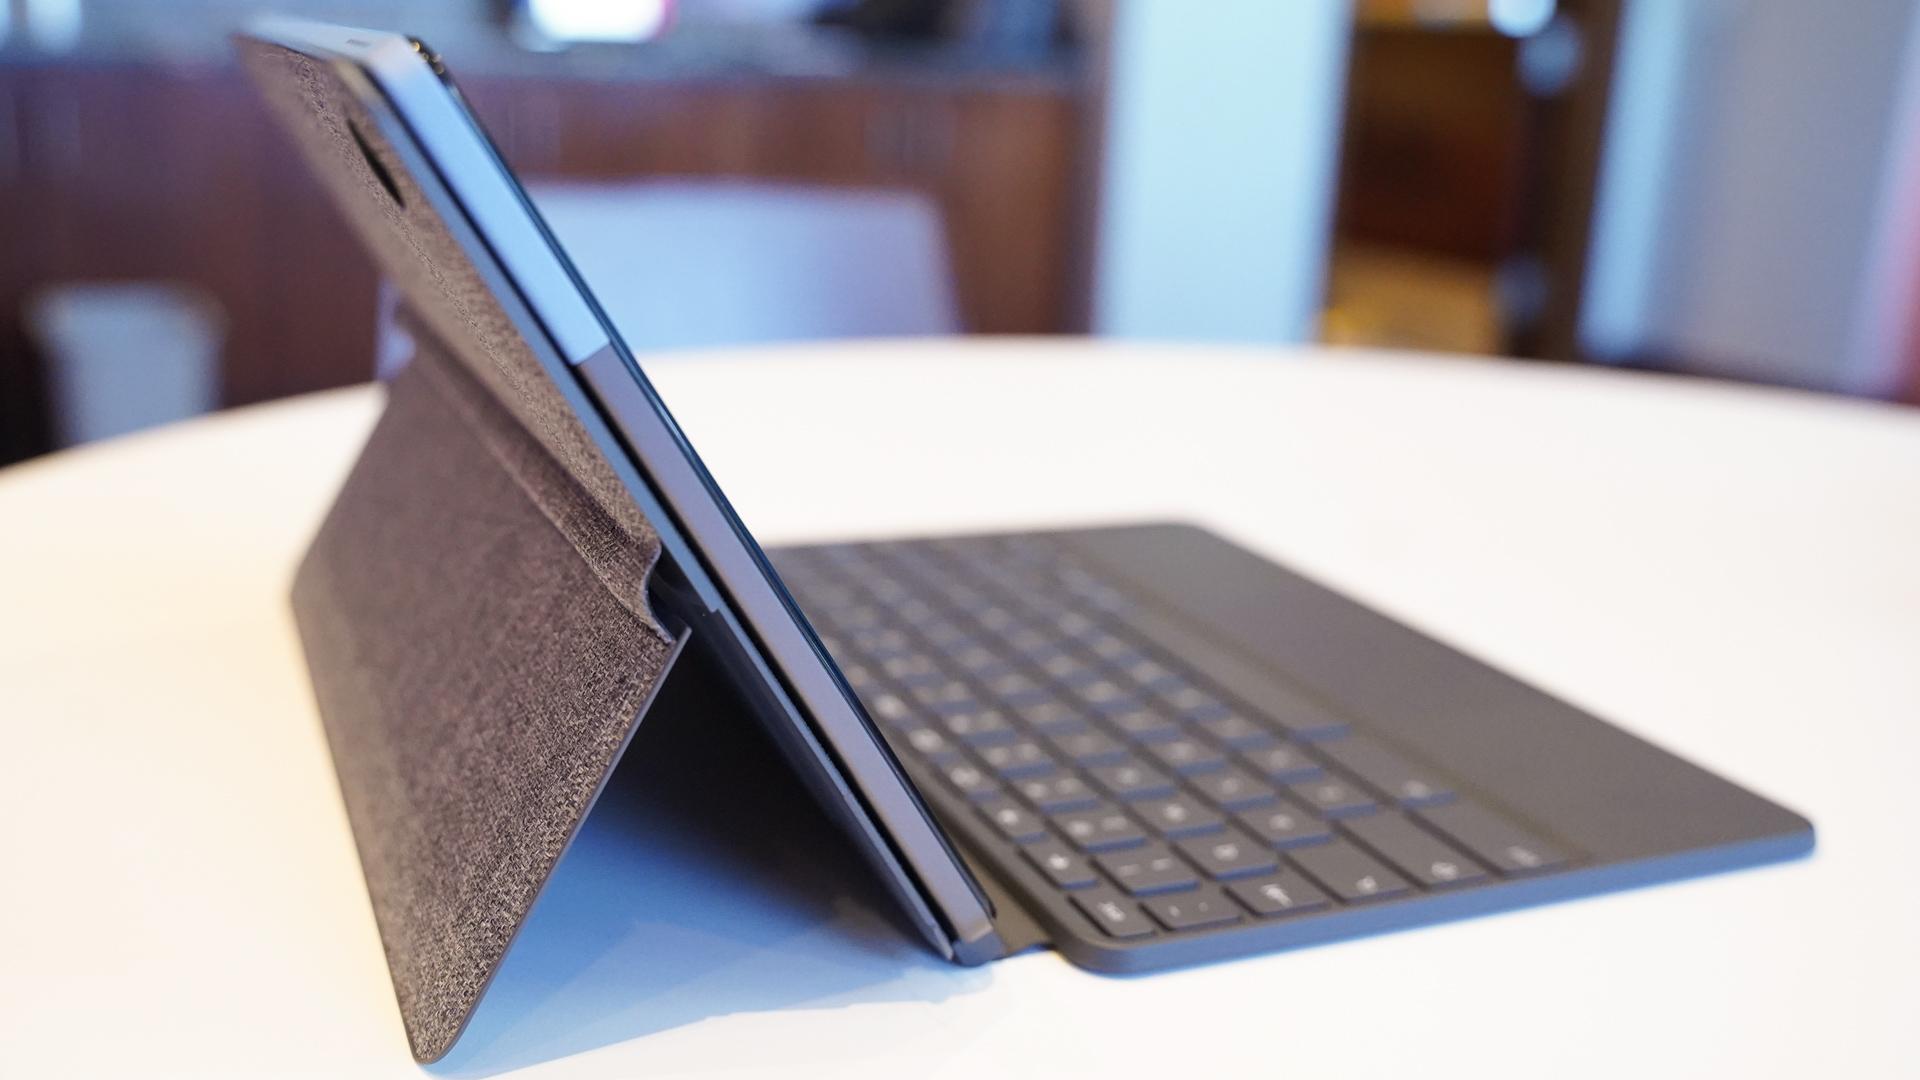 Lenovo IdeaPad Duet kickstand